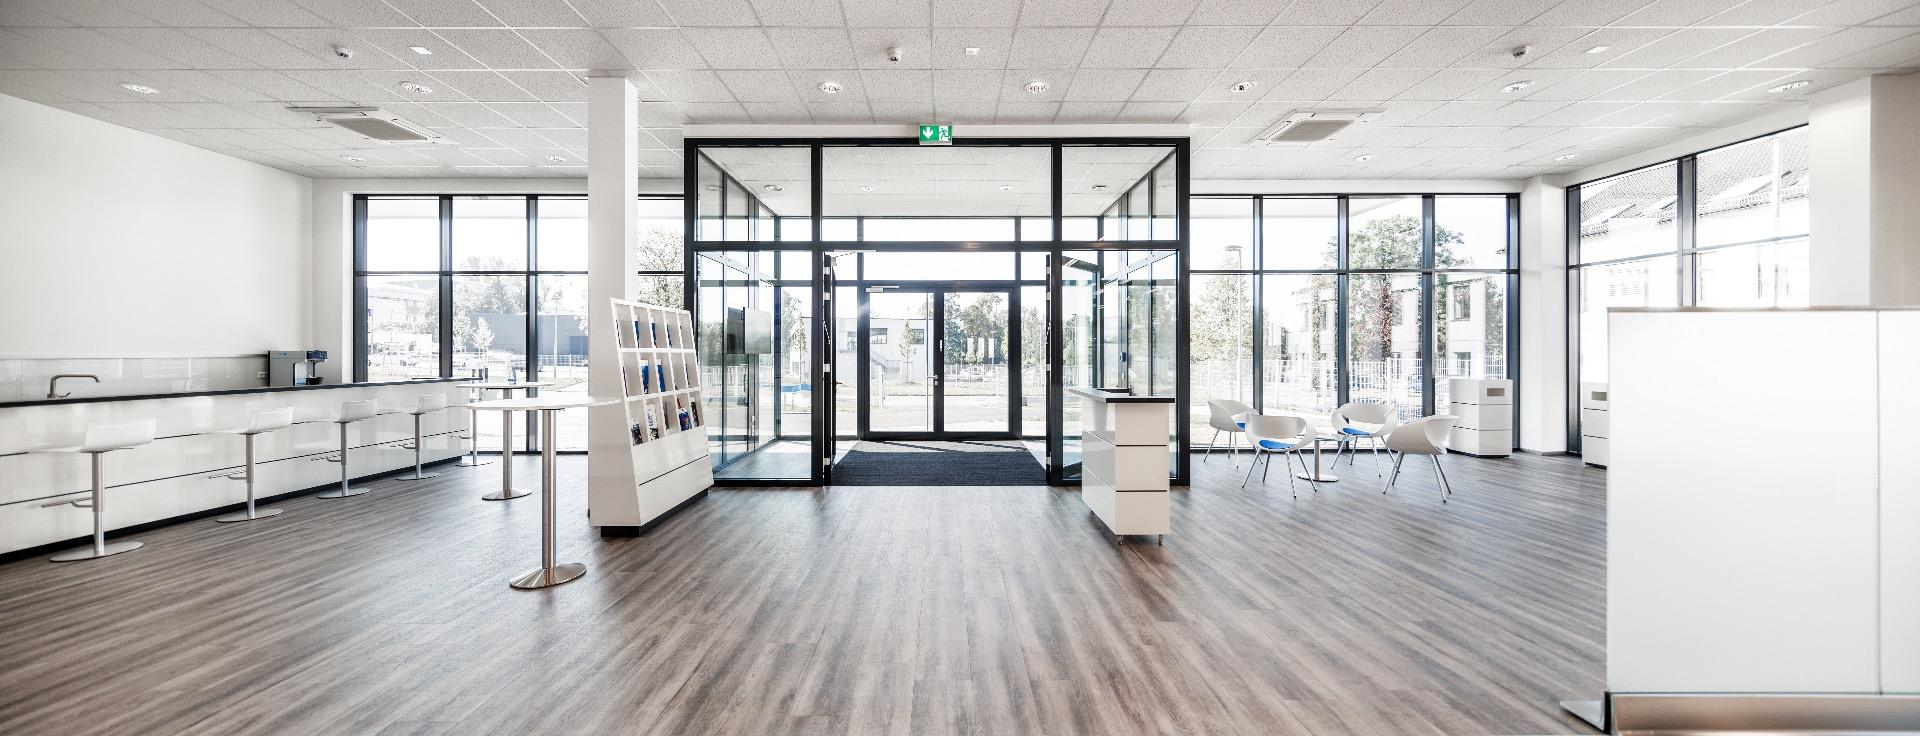 OSG Academy - Inside